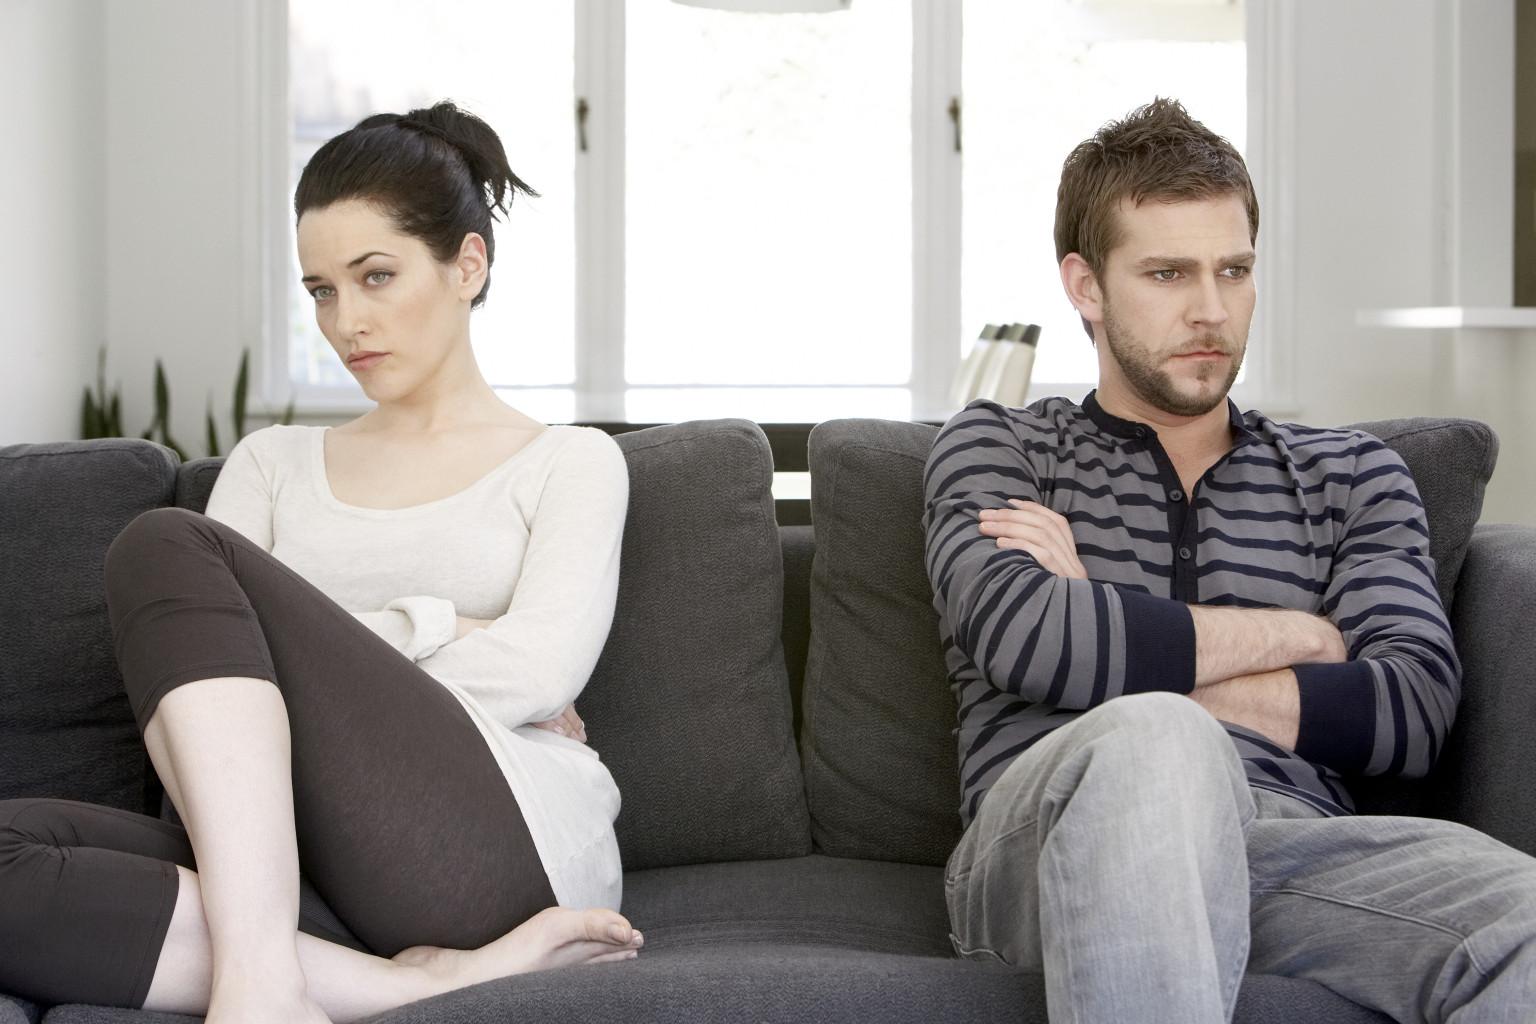 10 Tips atasi kejenuhan dalam berpacaran, nomor 6 paling mujarab!